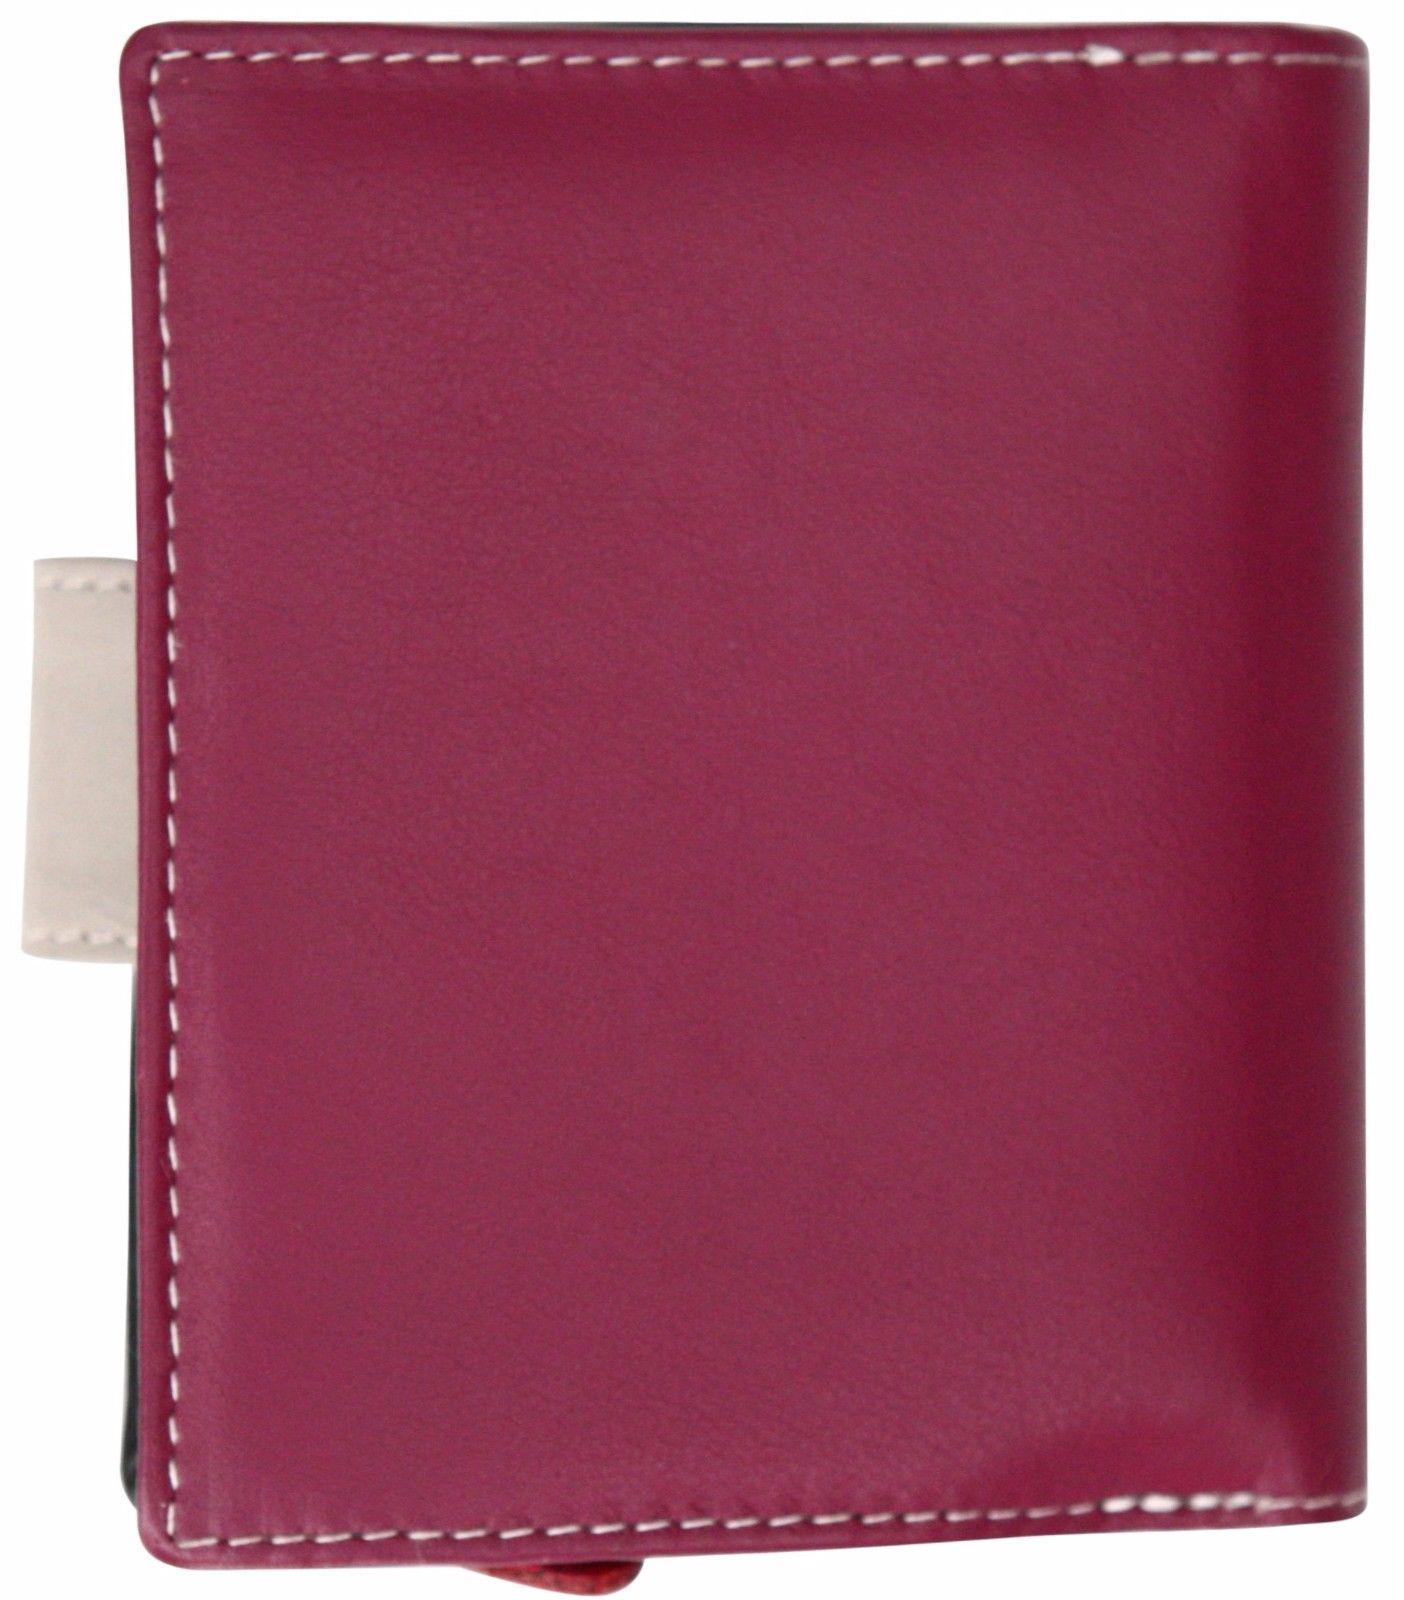 Felda-RFID-onorevoli-MEDAGLIA-amp-Card-Purse-Wallet-Genuine-Leather-Multi-SOFT-BOX-REGALO miniatura 47